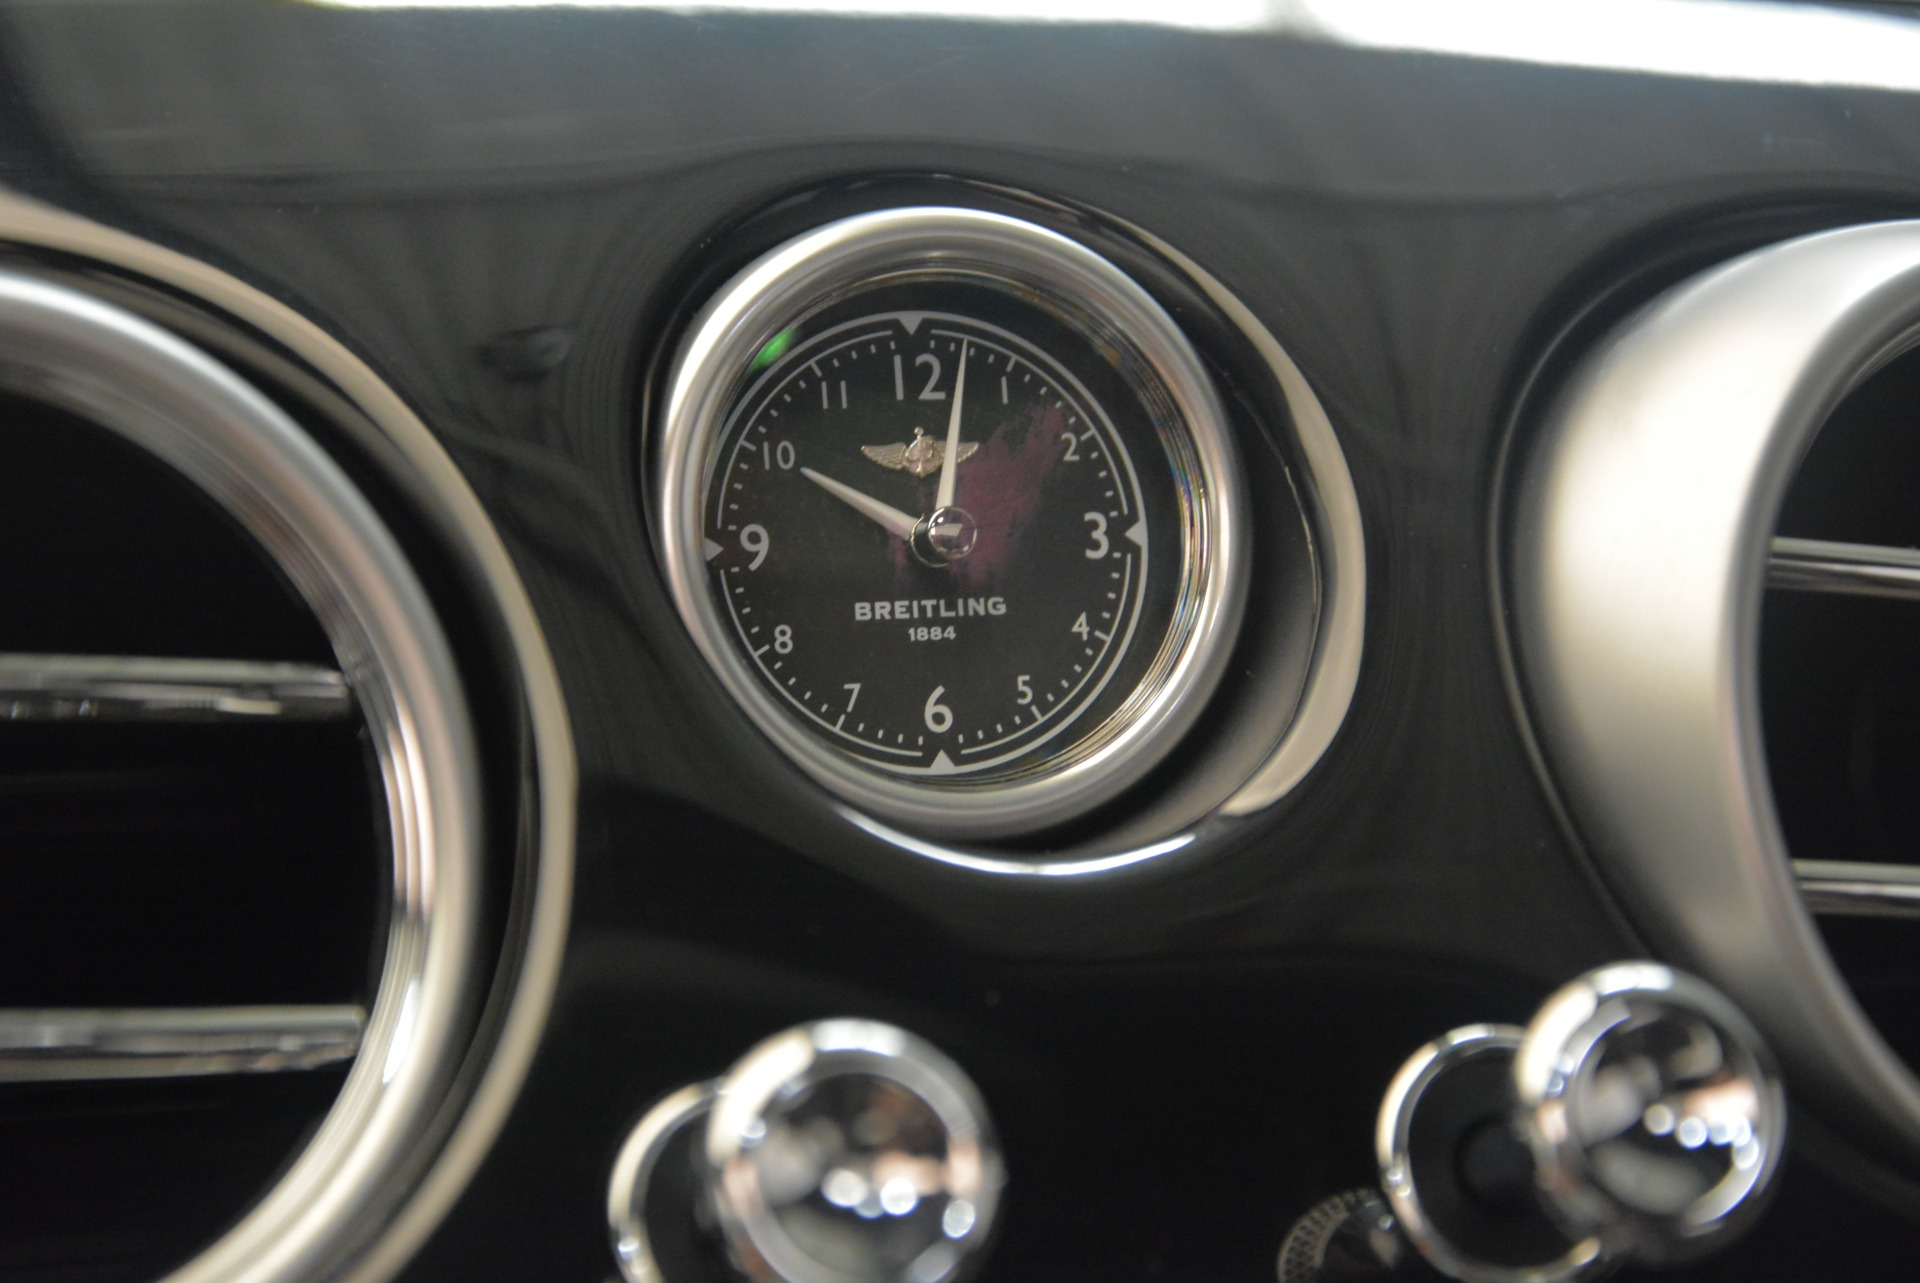 Used 2017 Bentley Flying Spur V8 S For Sale In Westport, CT 2263_p22